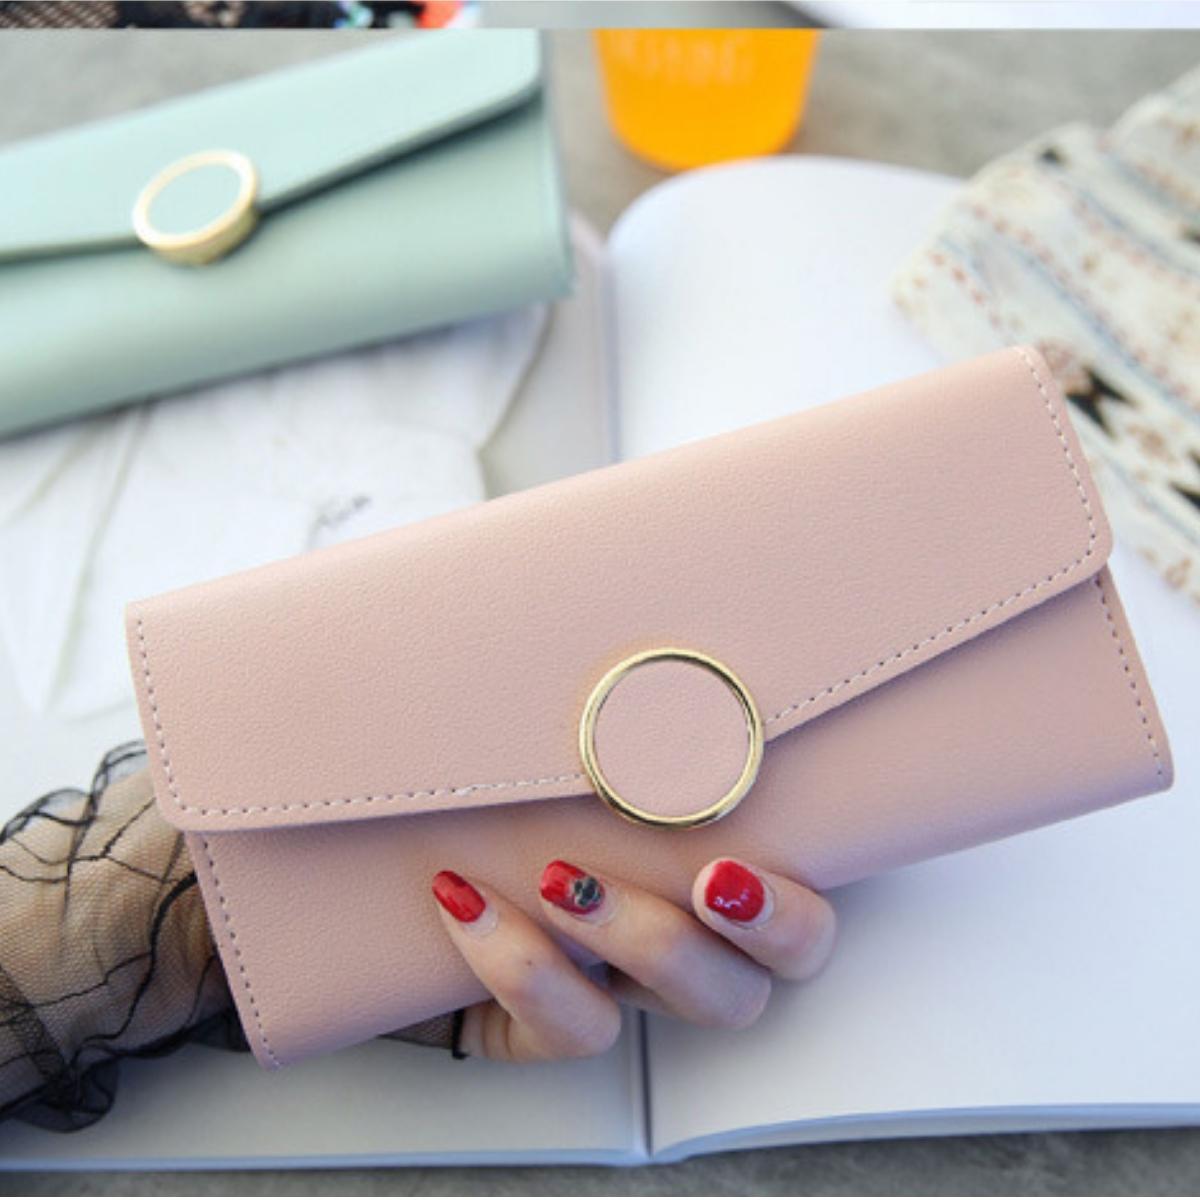 FashionSmith Dompet Wanita Lazada Panjang 10 Slot Saku New Royal Style